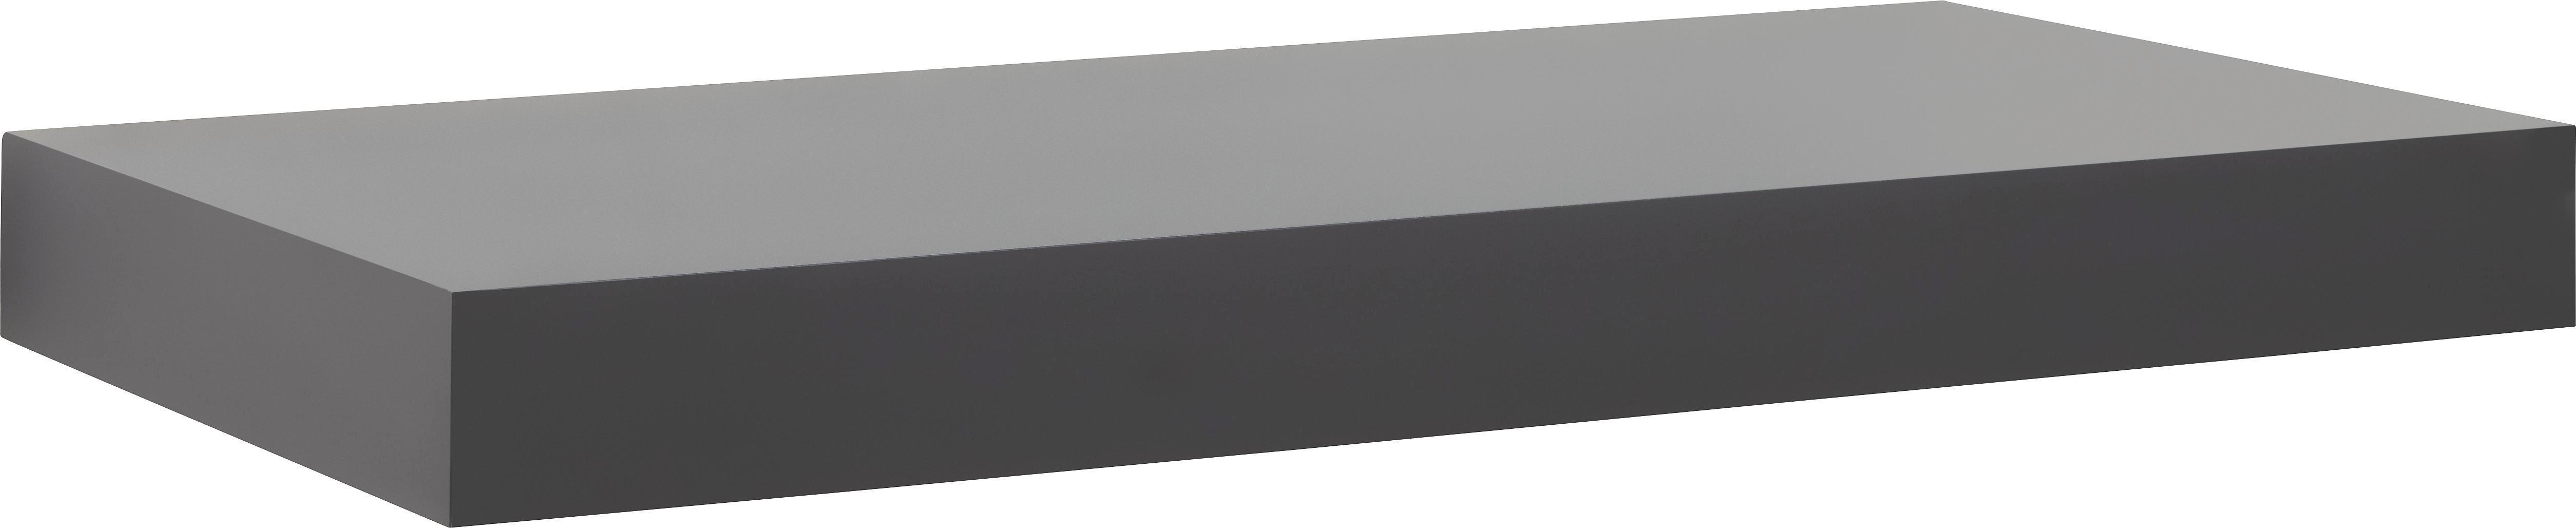 Polc Anja Schwarz   -sb- - fekete, faanyagok (50/4,5/24cm)